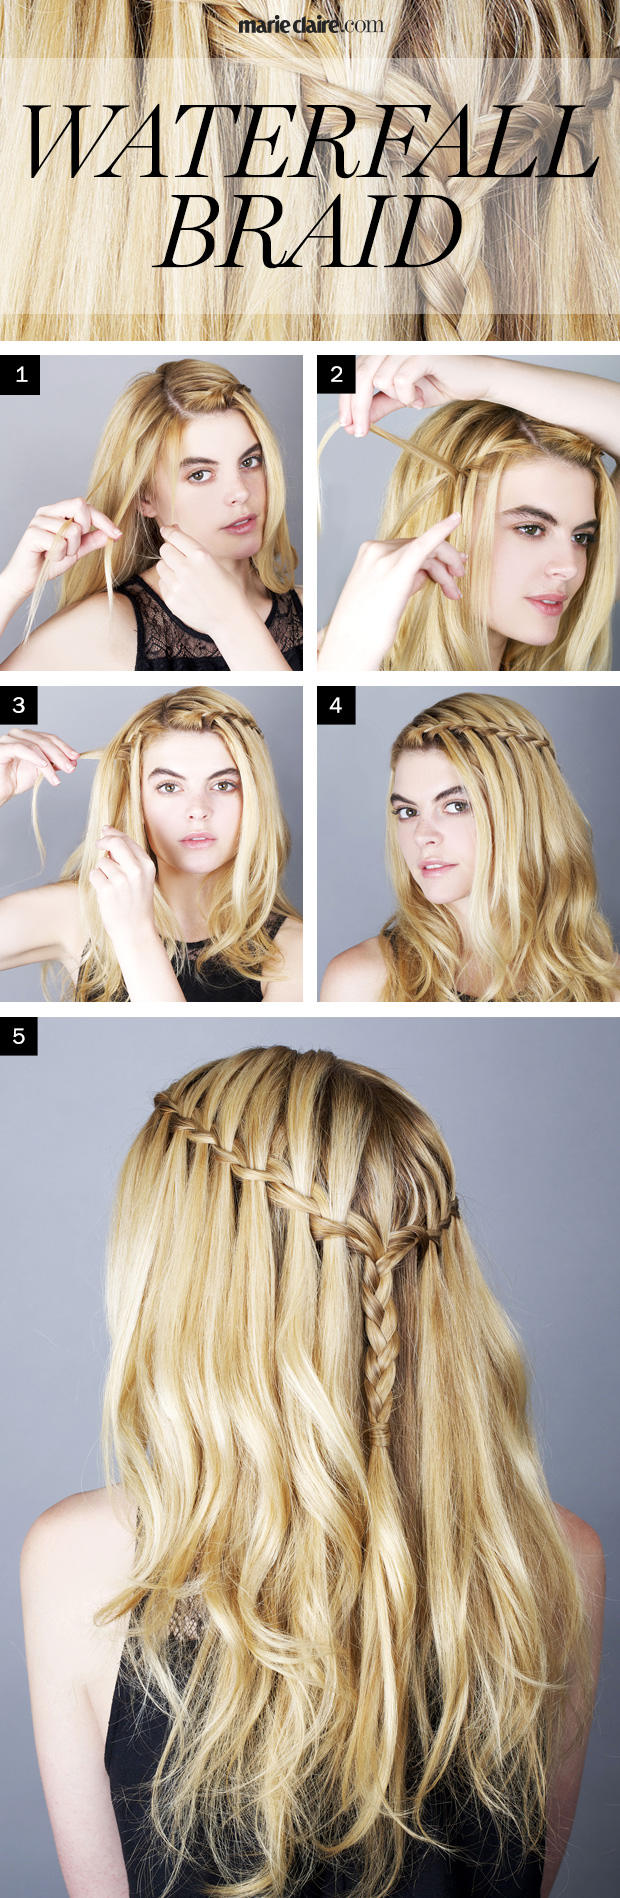 Stupendous How To Do A Waterfall Braid Easy Waterfall Braid Tutorial Hairstyles For Women Draintrainus